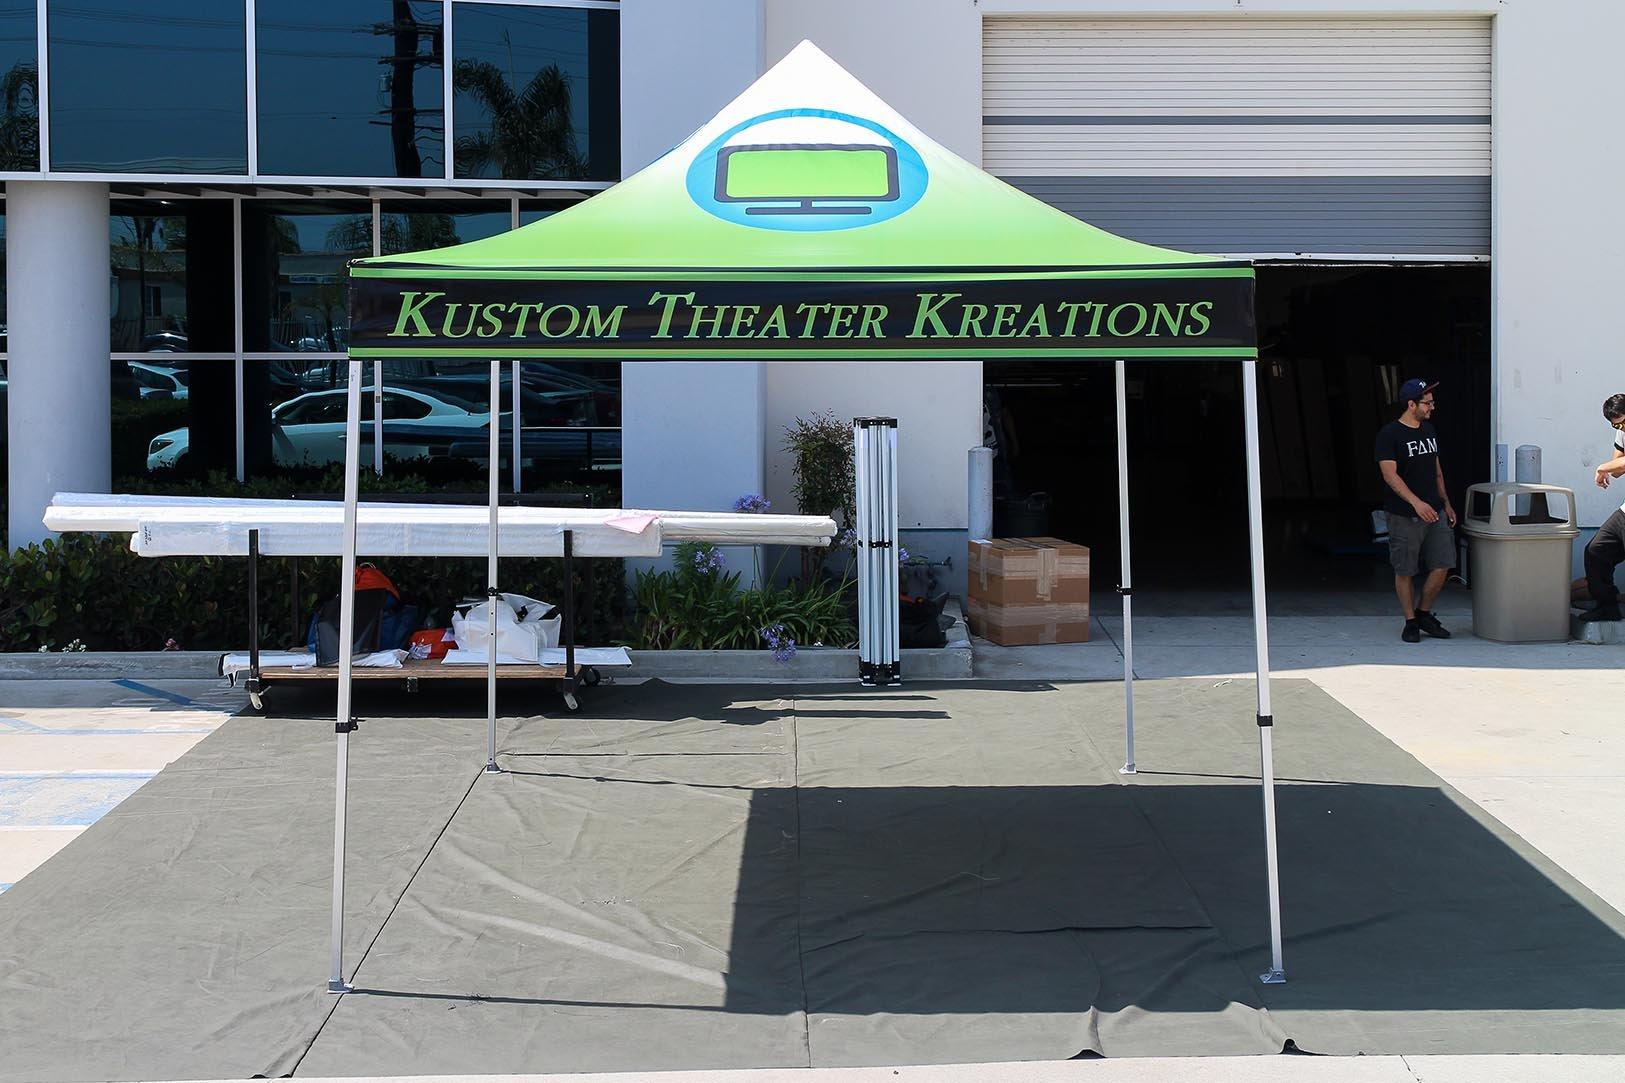 kustom-theater-kreations-tent